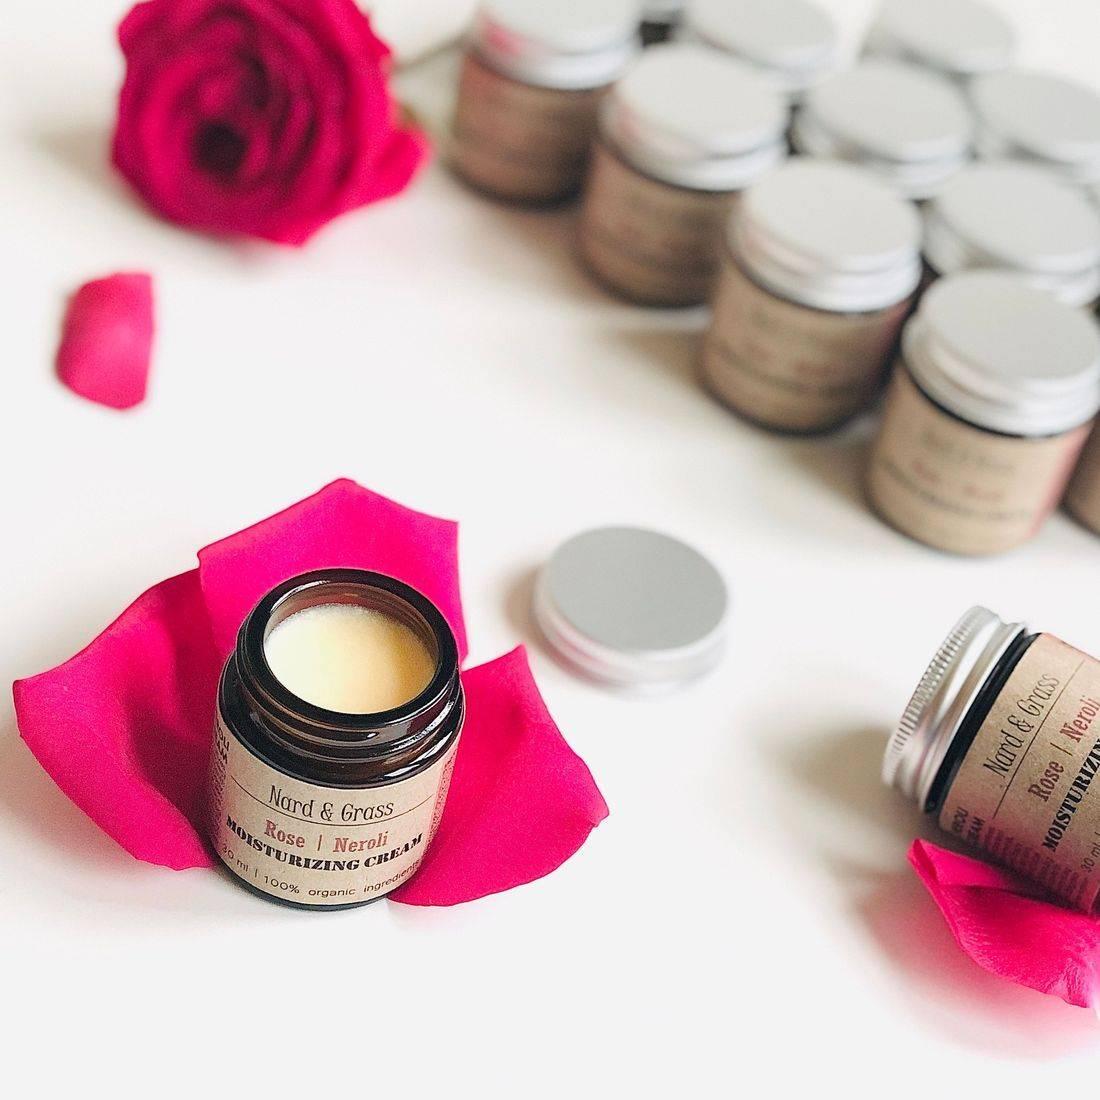 Nard & Grass Rose Neroli Cream, Rose Balm, Rose Face Cream, Organic Rose Face Balm, RosePost Box, Bulgarian Rose Oil, Organic Rose Oil, Clean Rose Infused Skincare